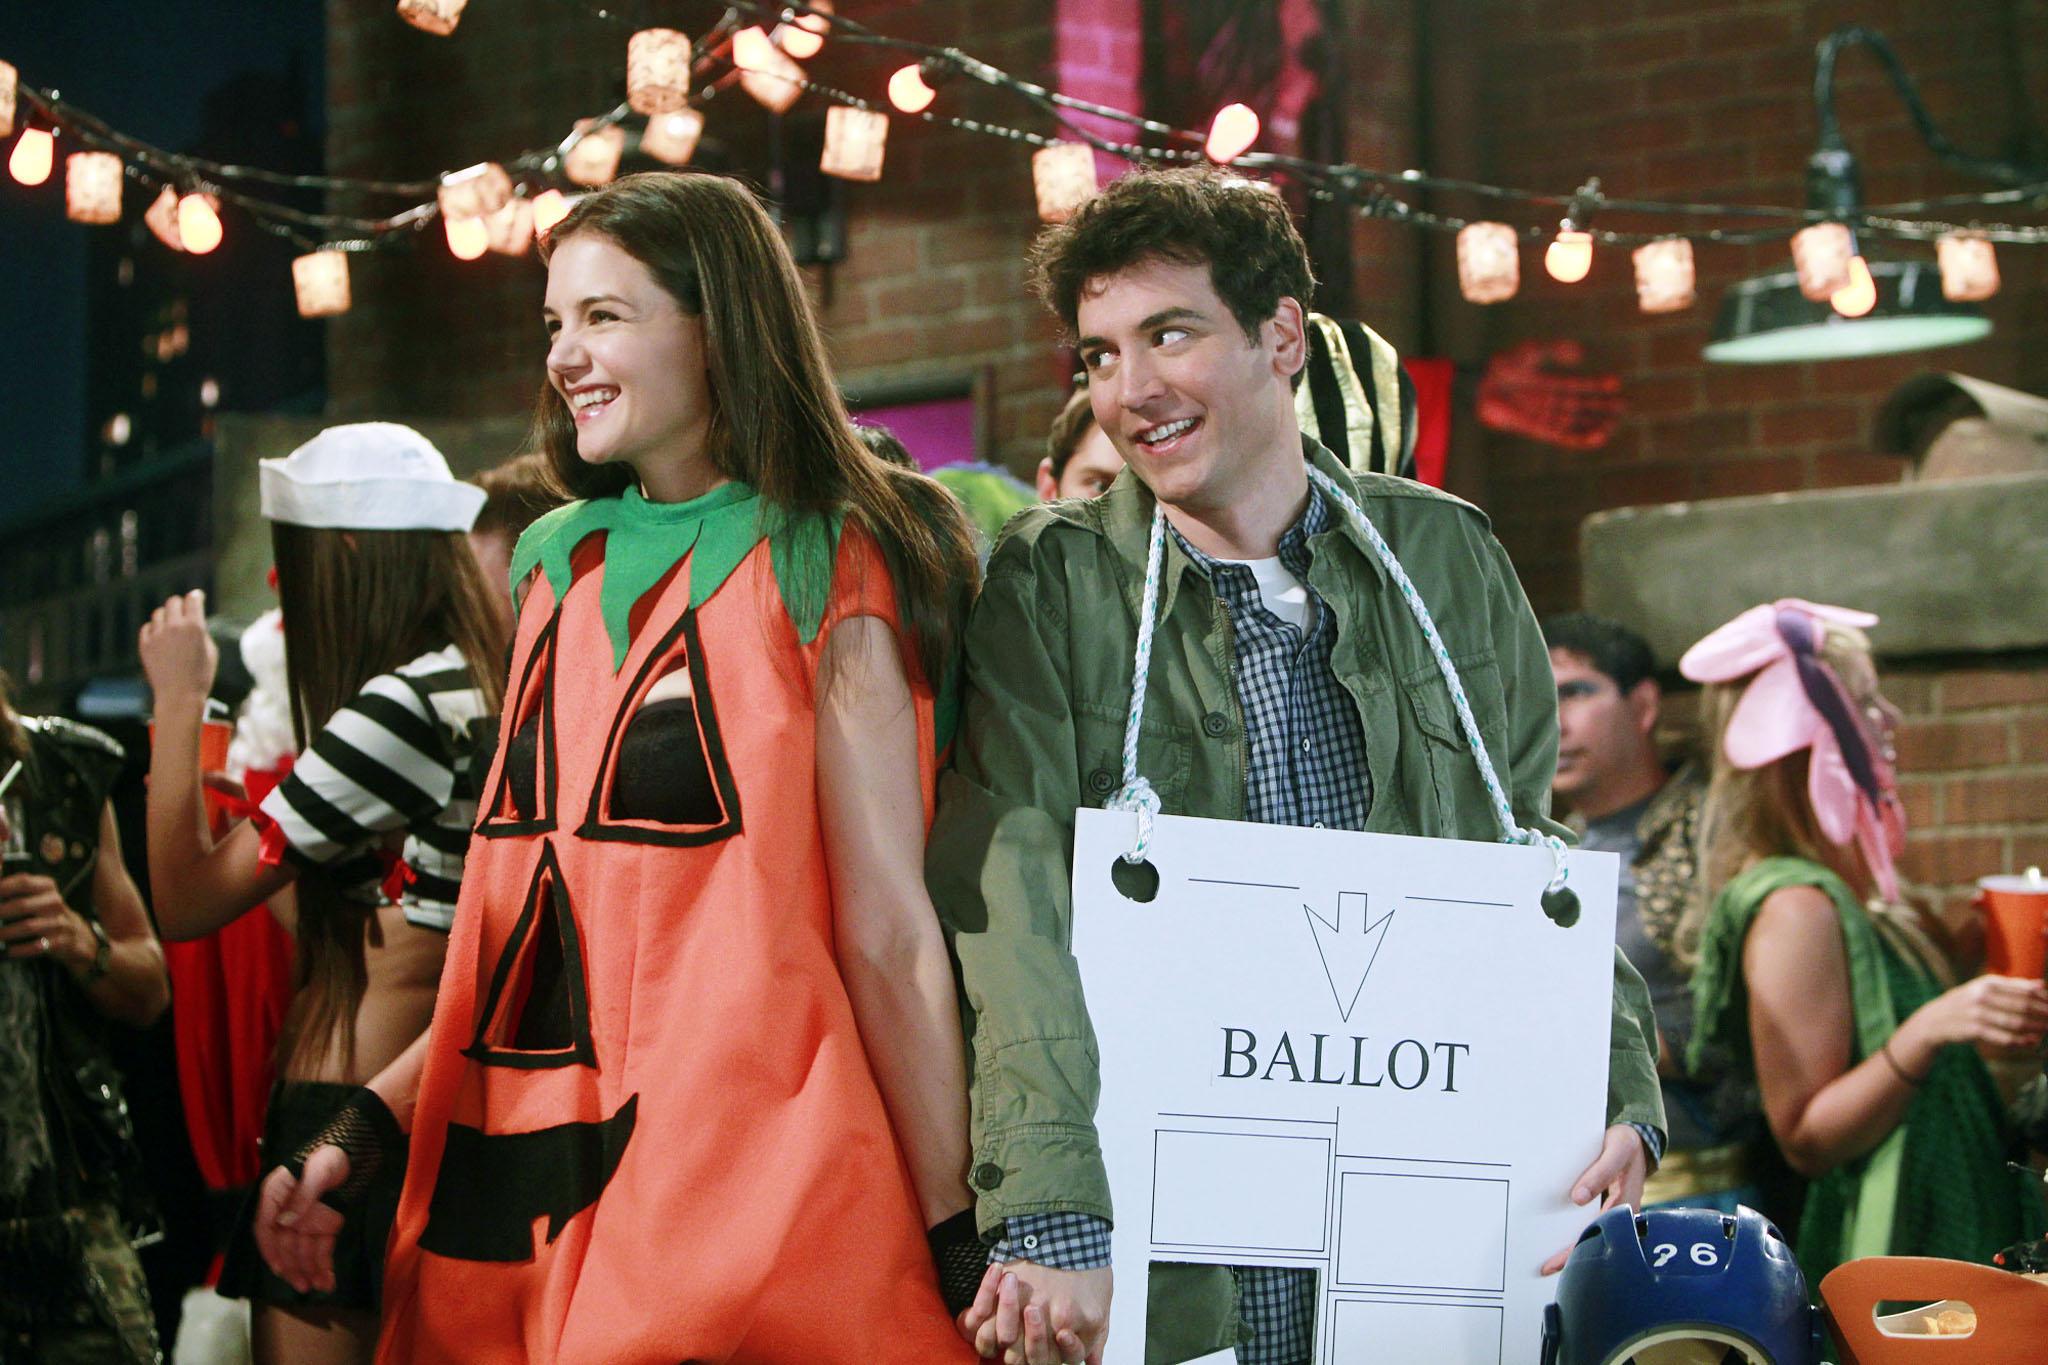 The Hanging Chad Costume/Slutty Pumpkin Flashback